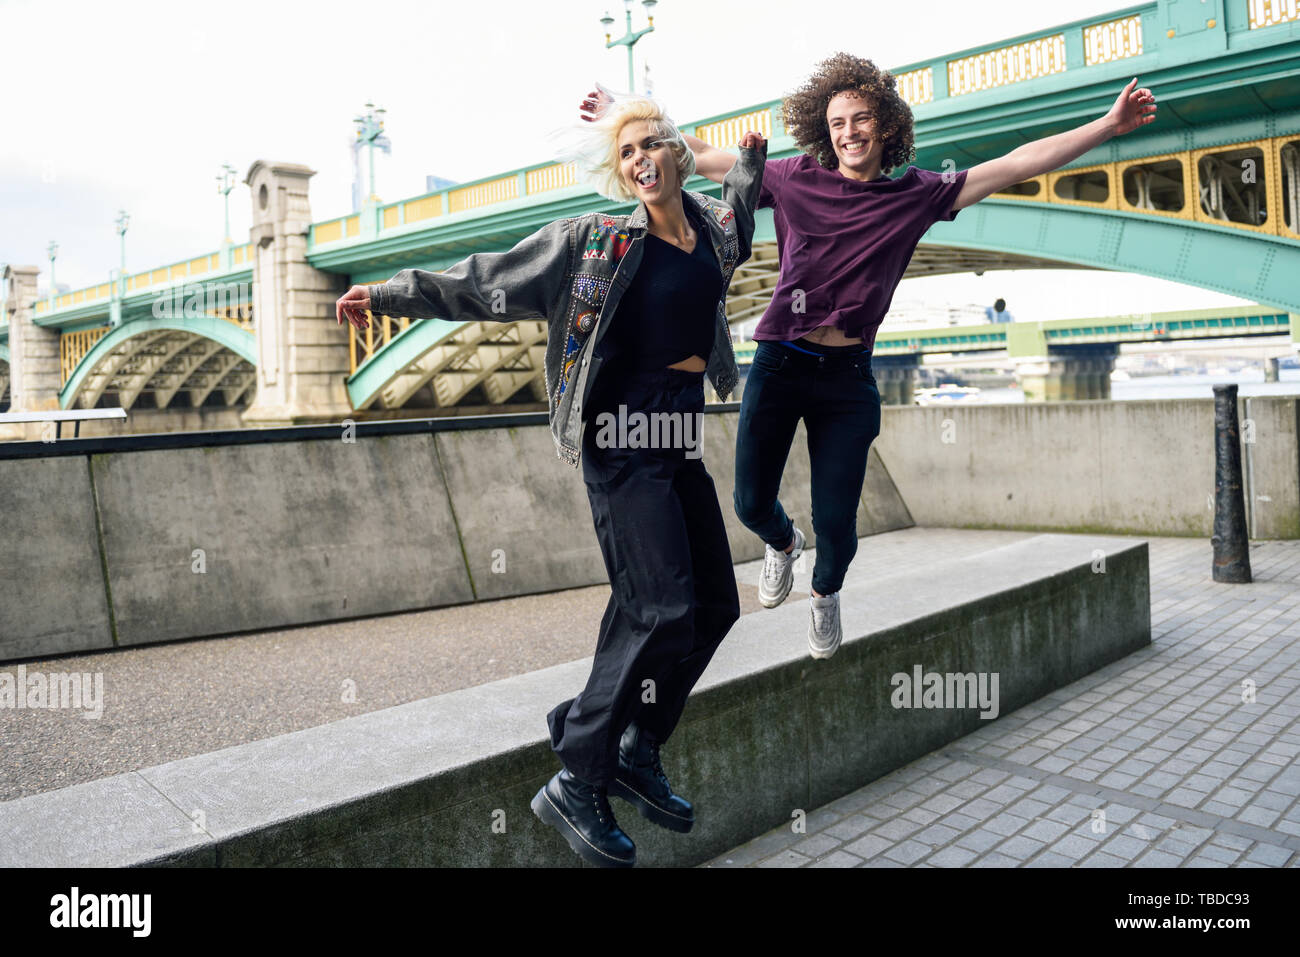 Funny couple junping near the Southwark bridge over River Thames, London - Stock Image